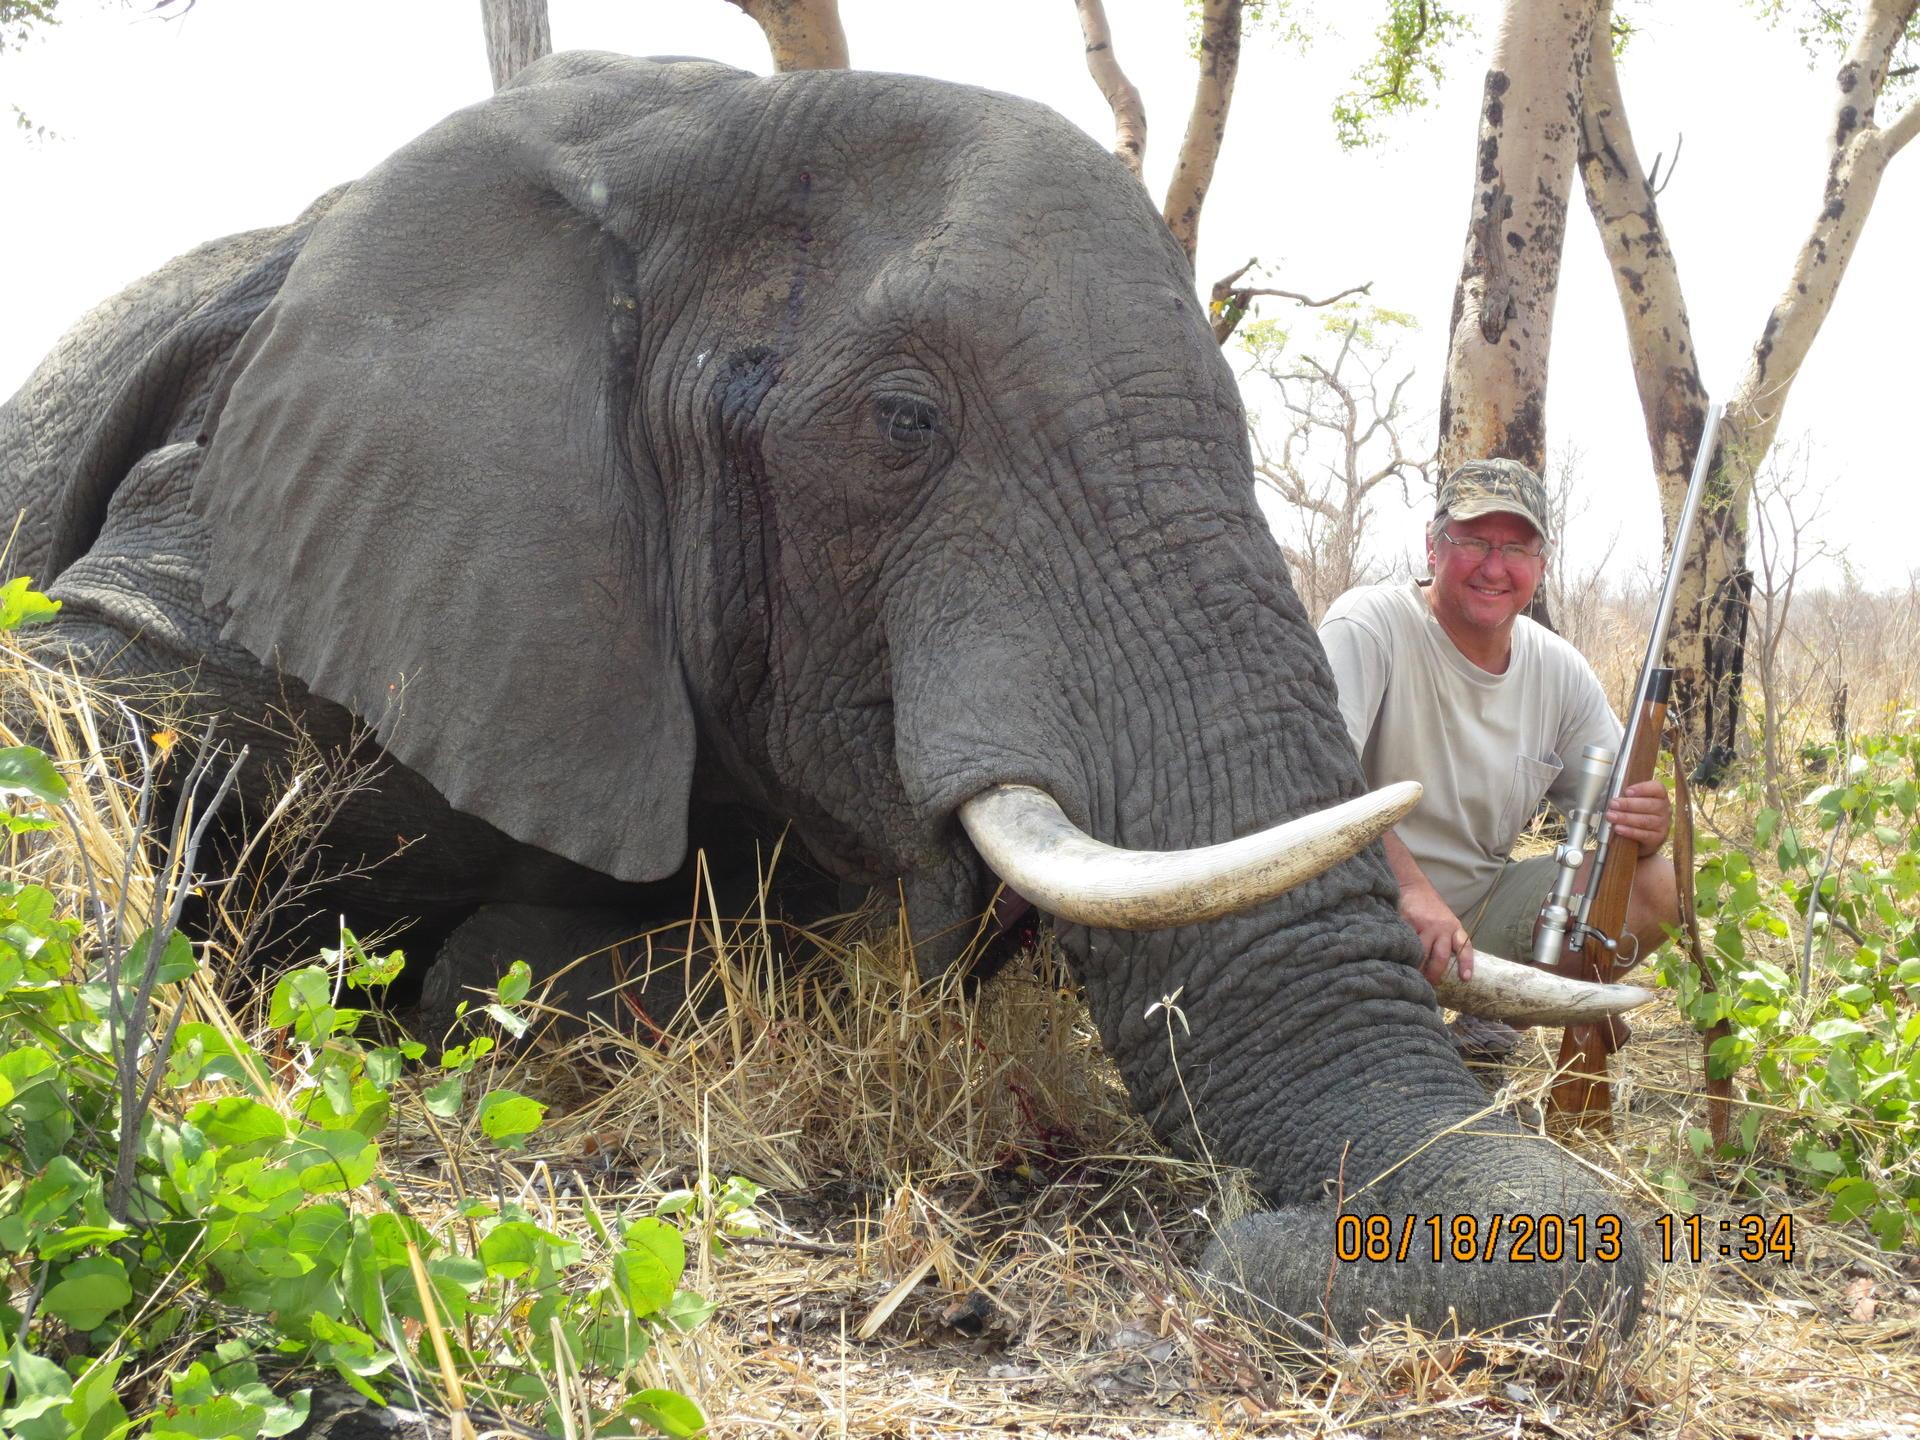 Dan Gorecki Elephant August 2013 208.jpg